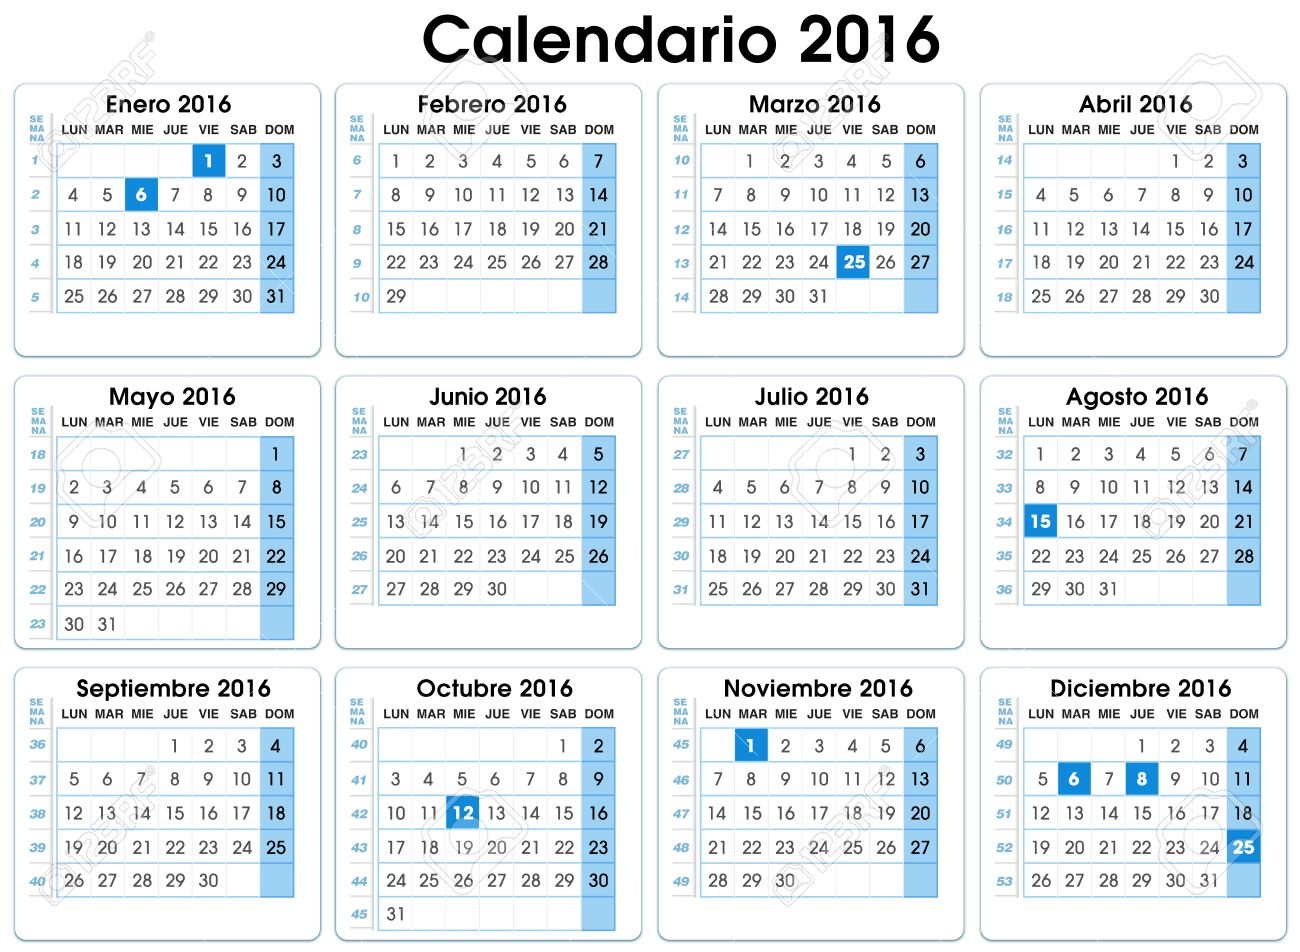 calendar vertical 2016 spanish 12 months indicating number